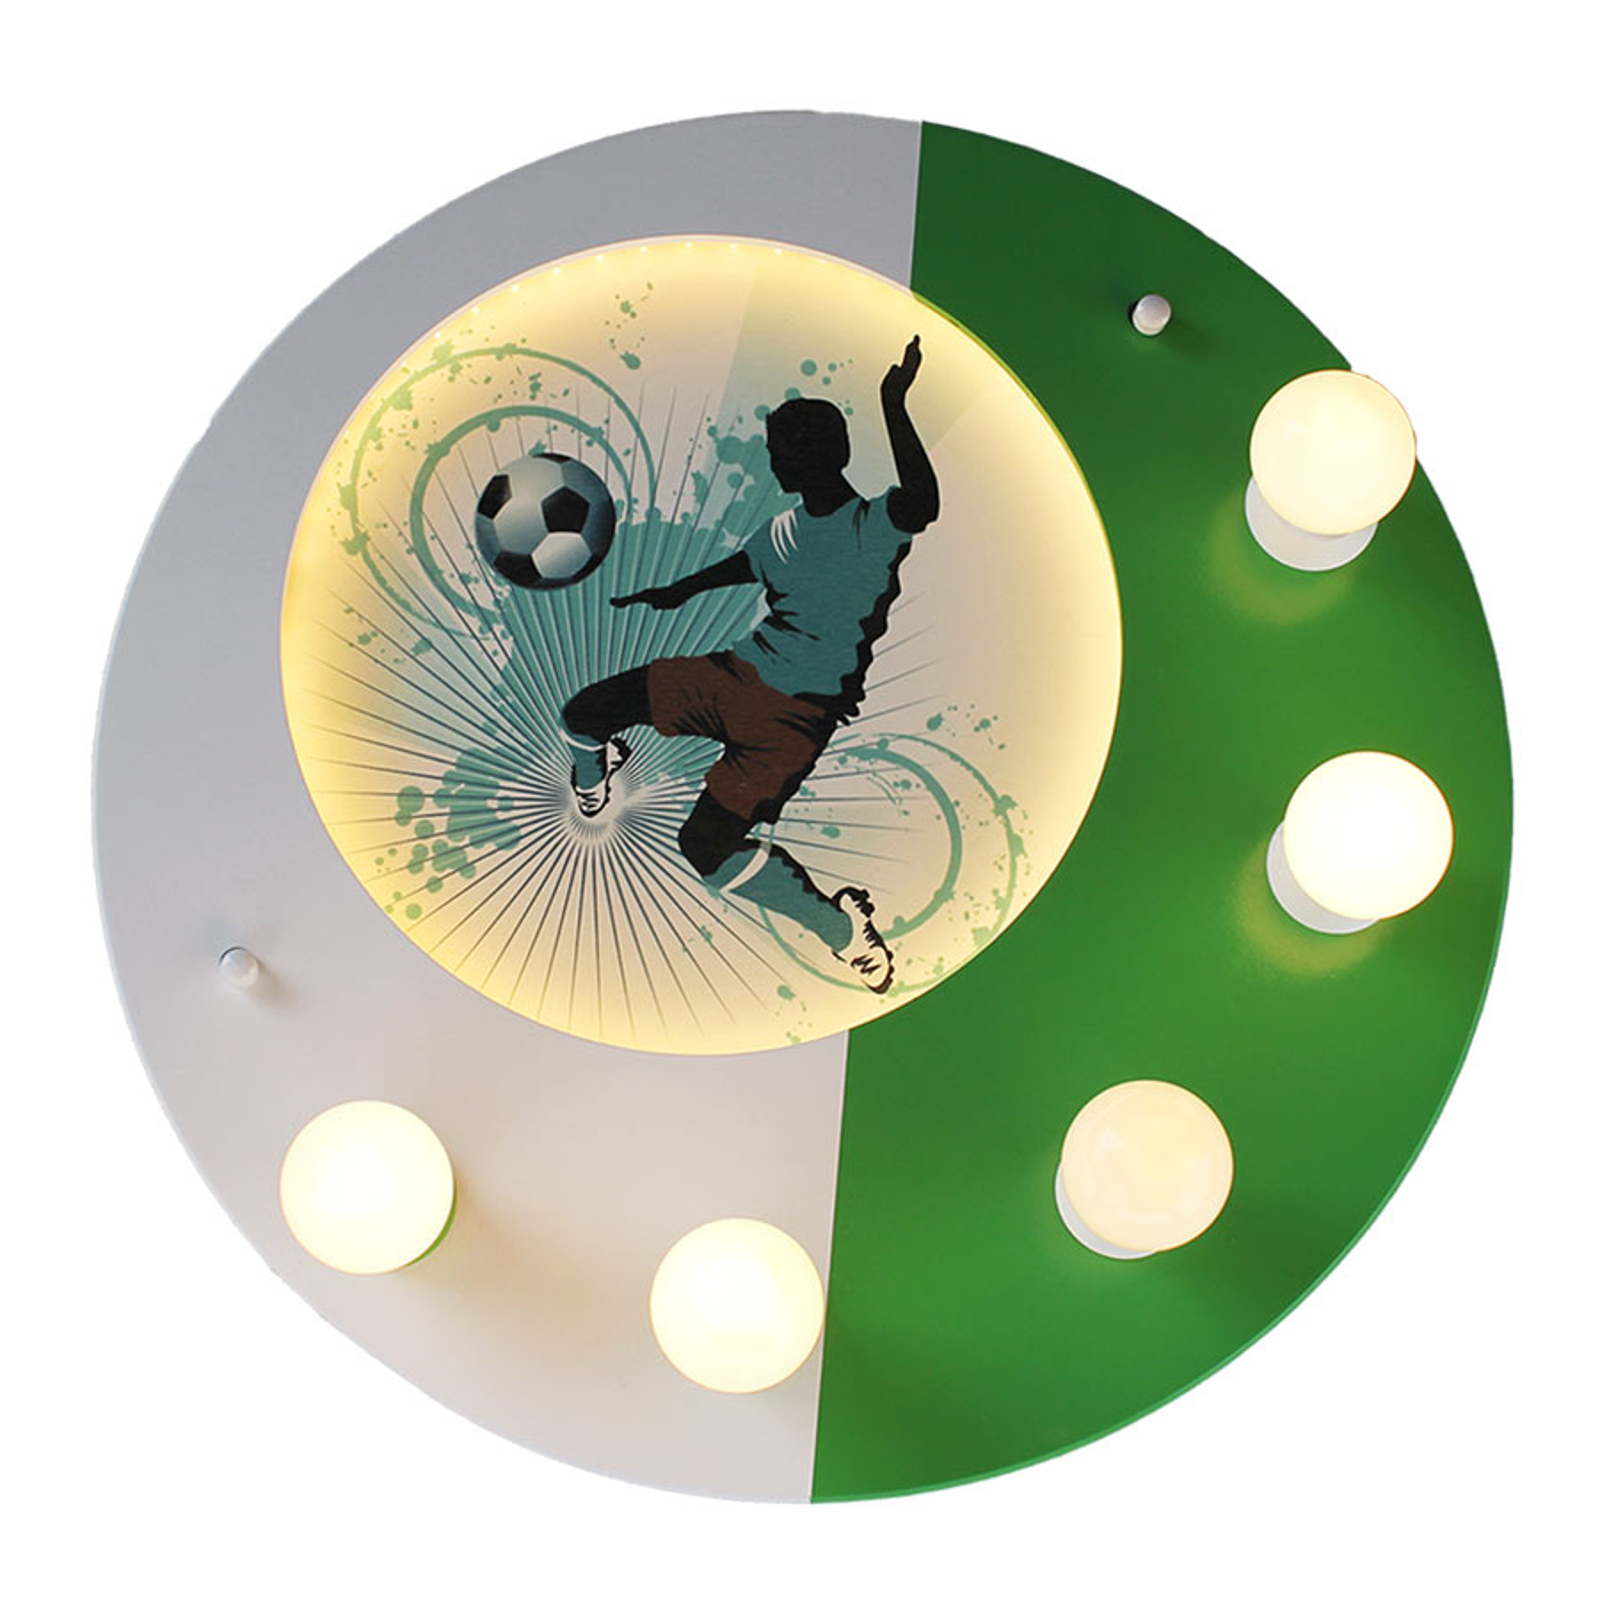 Plafondlamp Soccer, 5-lamps, groen-wit